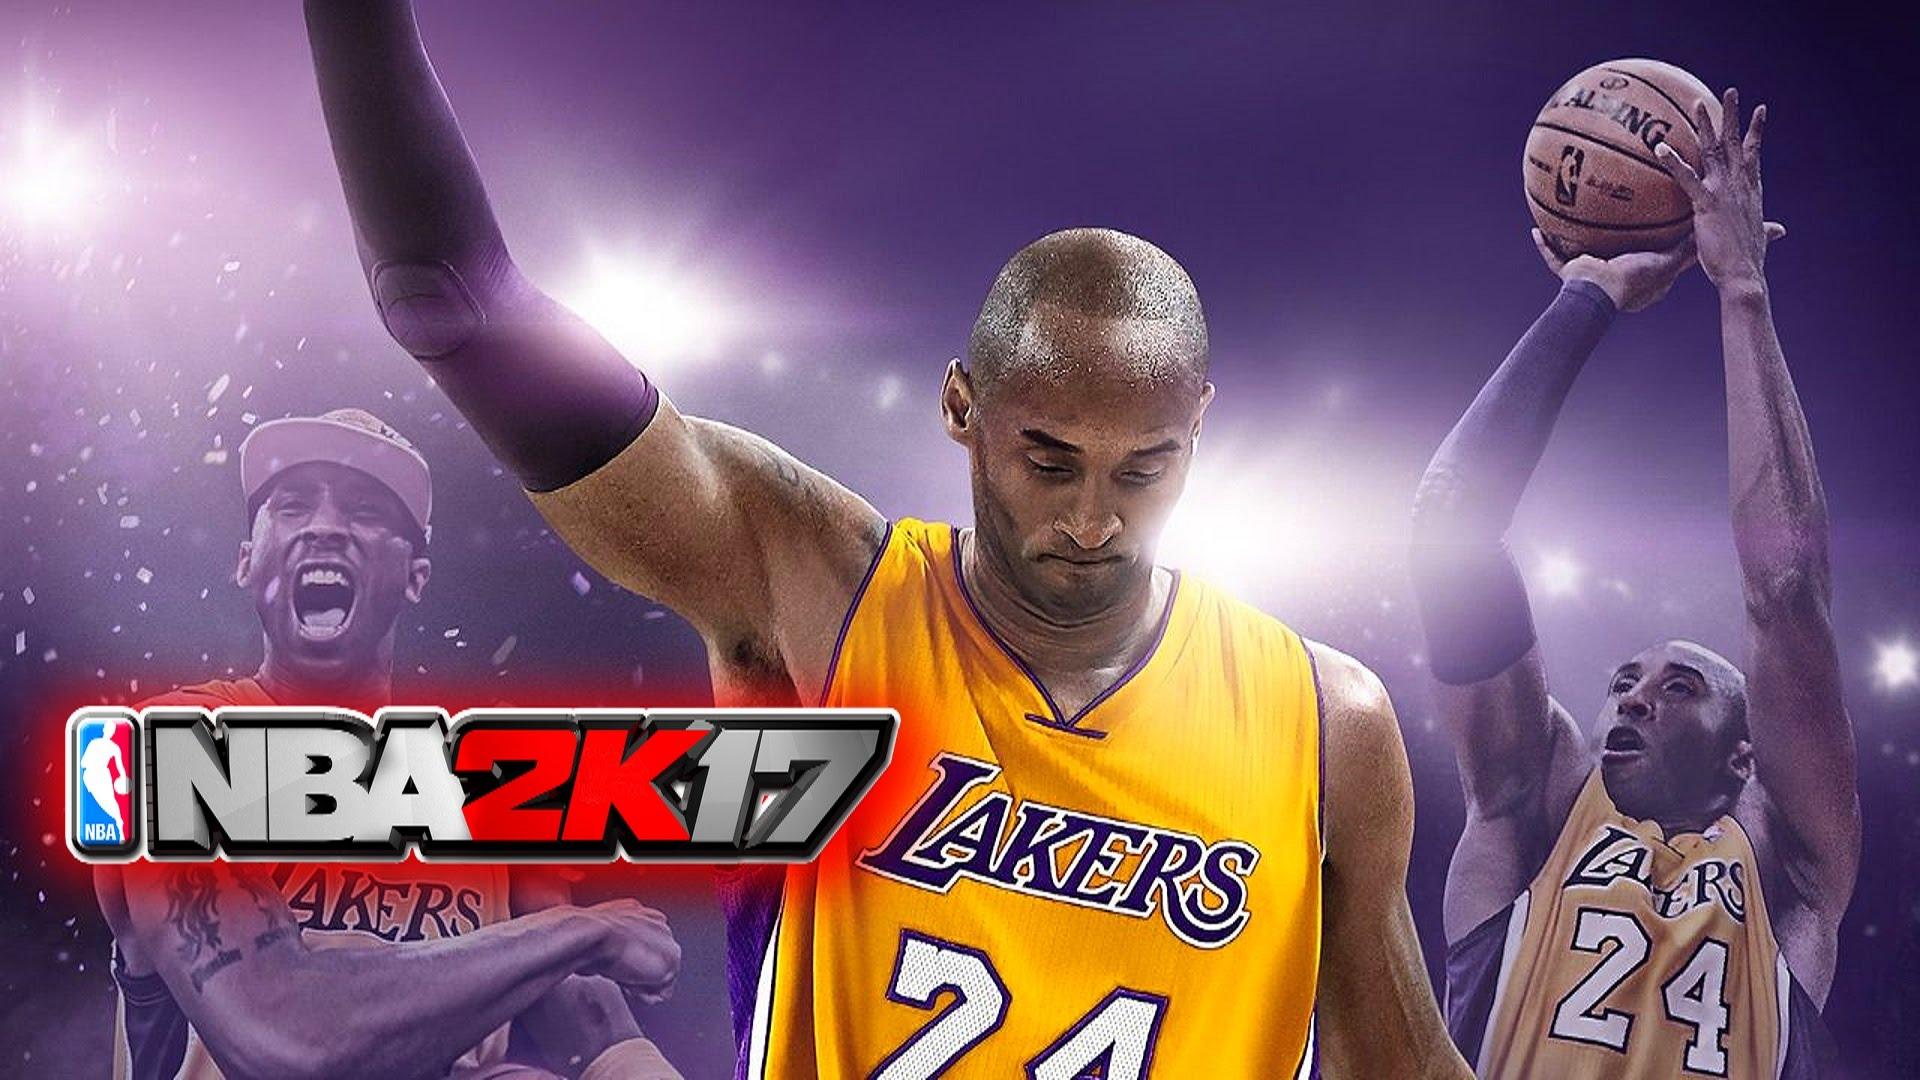 NBA 2K17 Free Download - CroHasIt - Download PC Games For Free